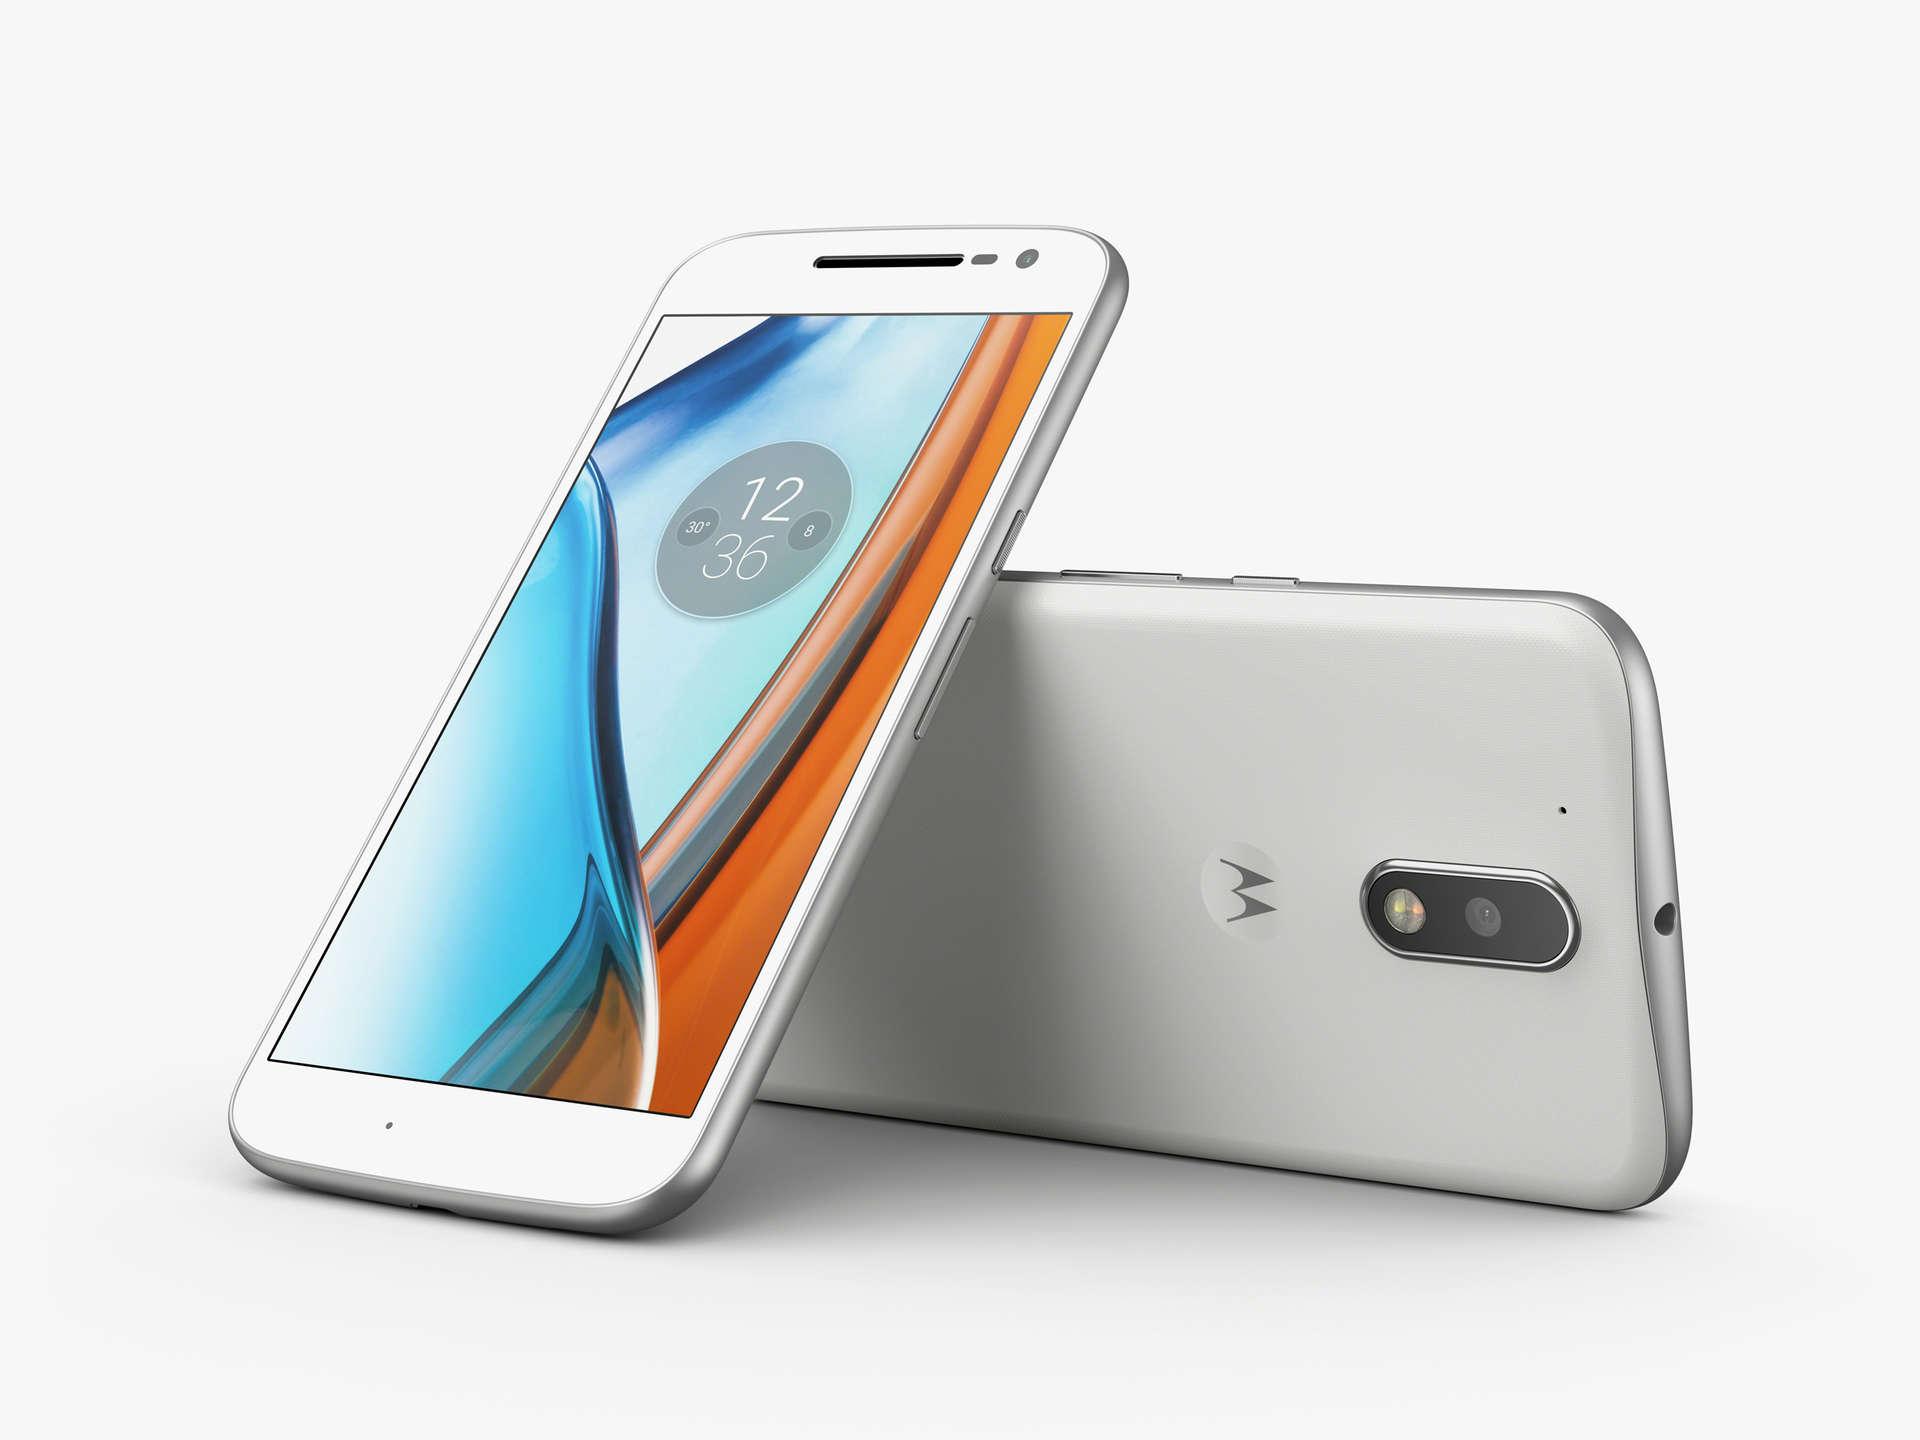 How to Root the Motorola Moto G4 & Moto G4 Plus